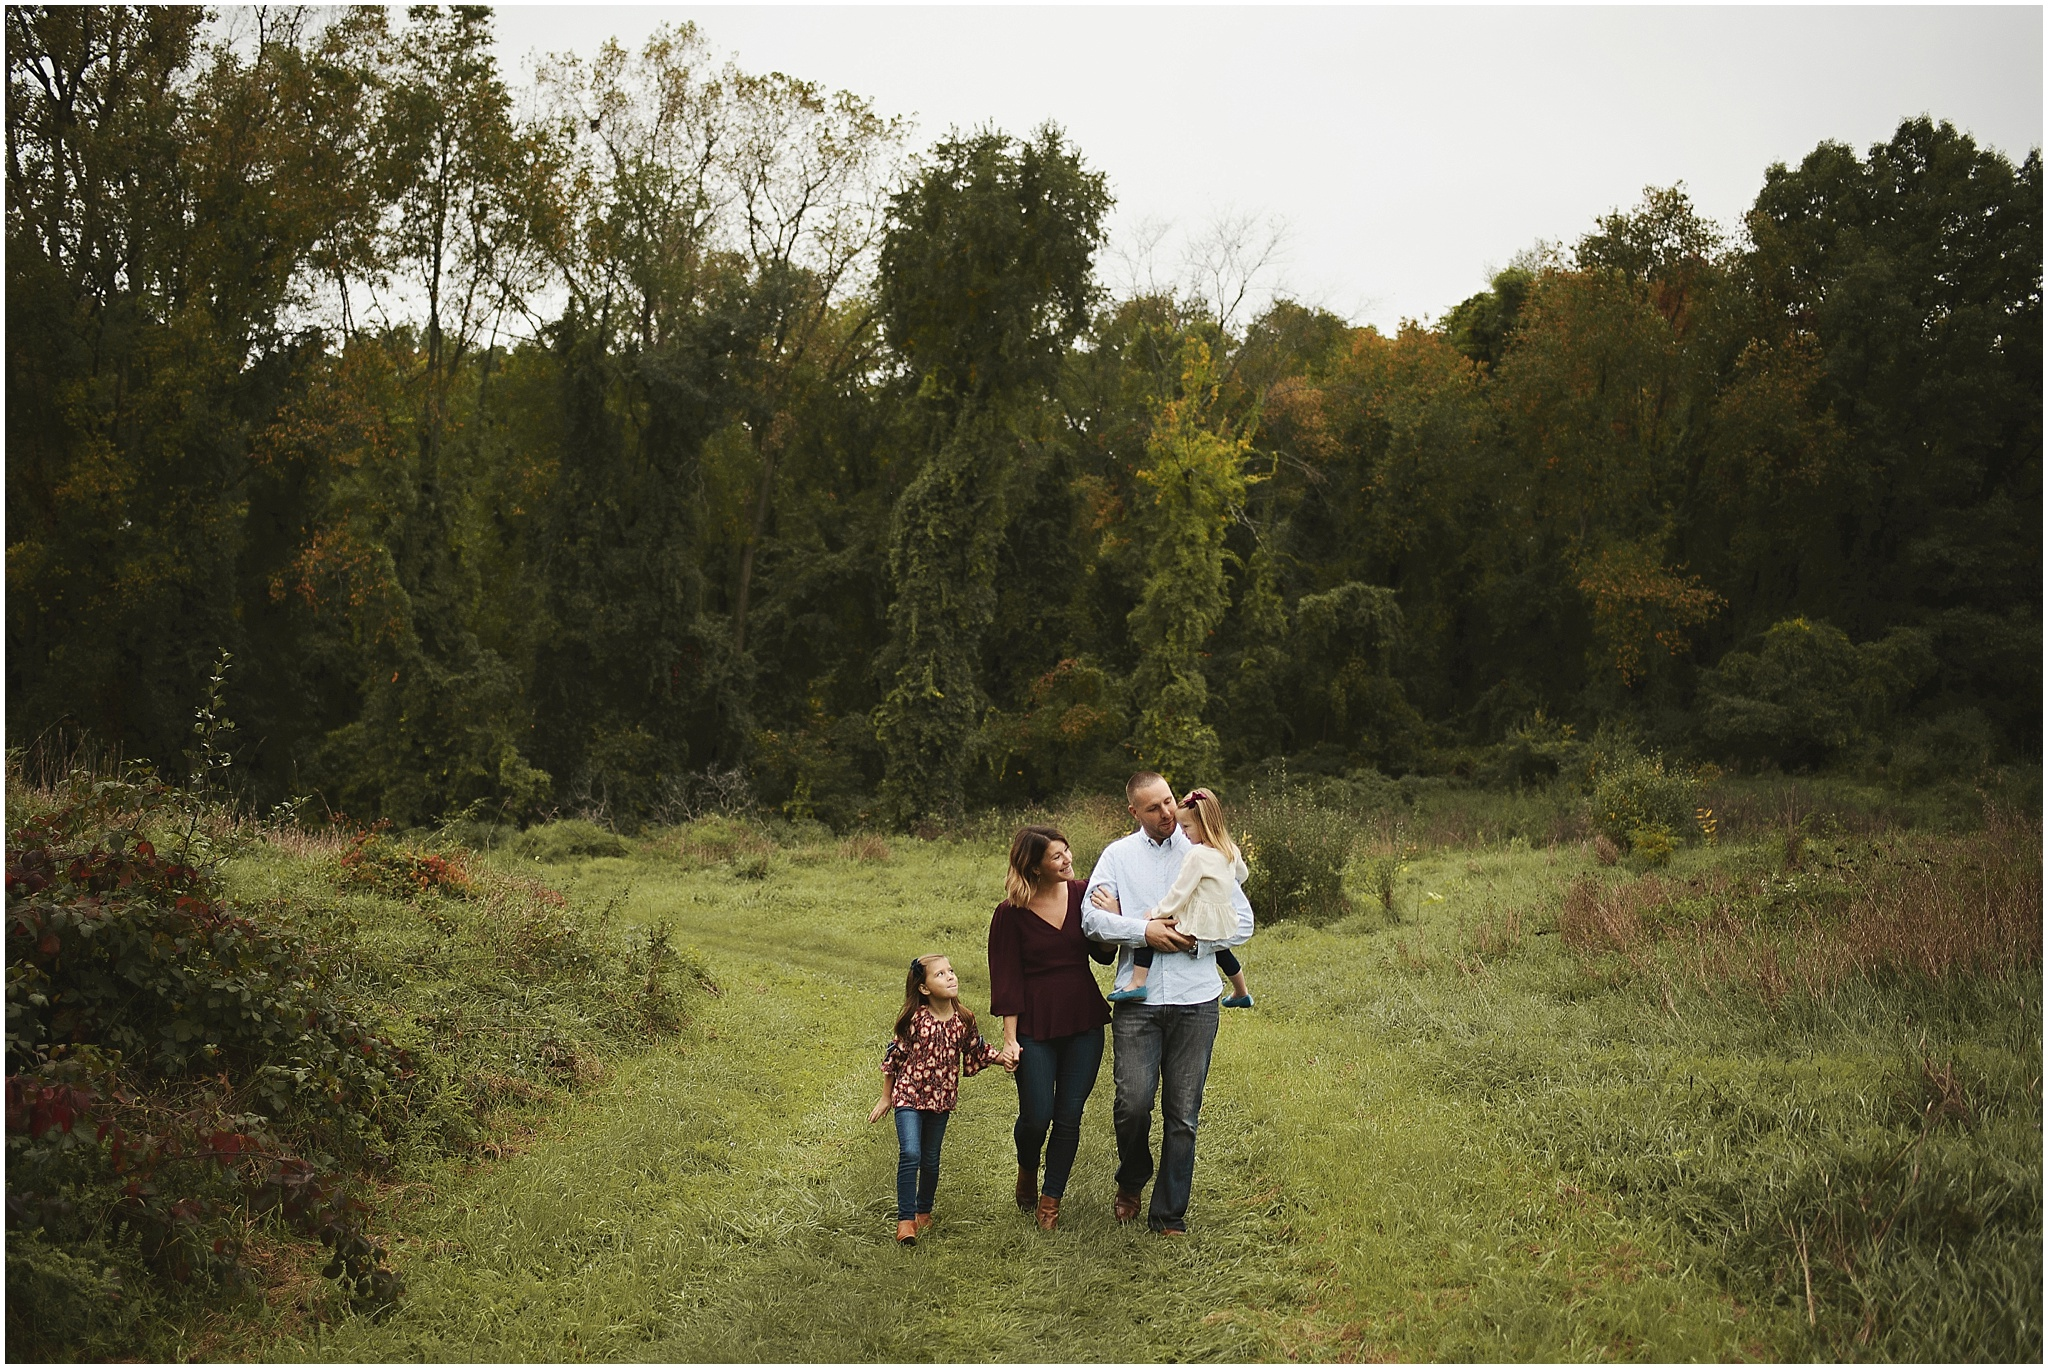 karra lynn photography - family photographer milford mi - family walking